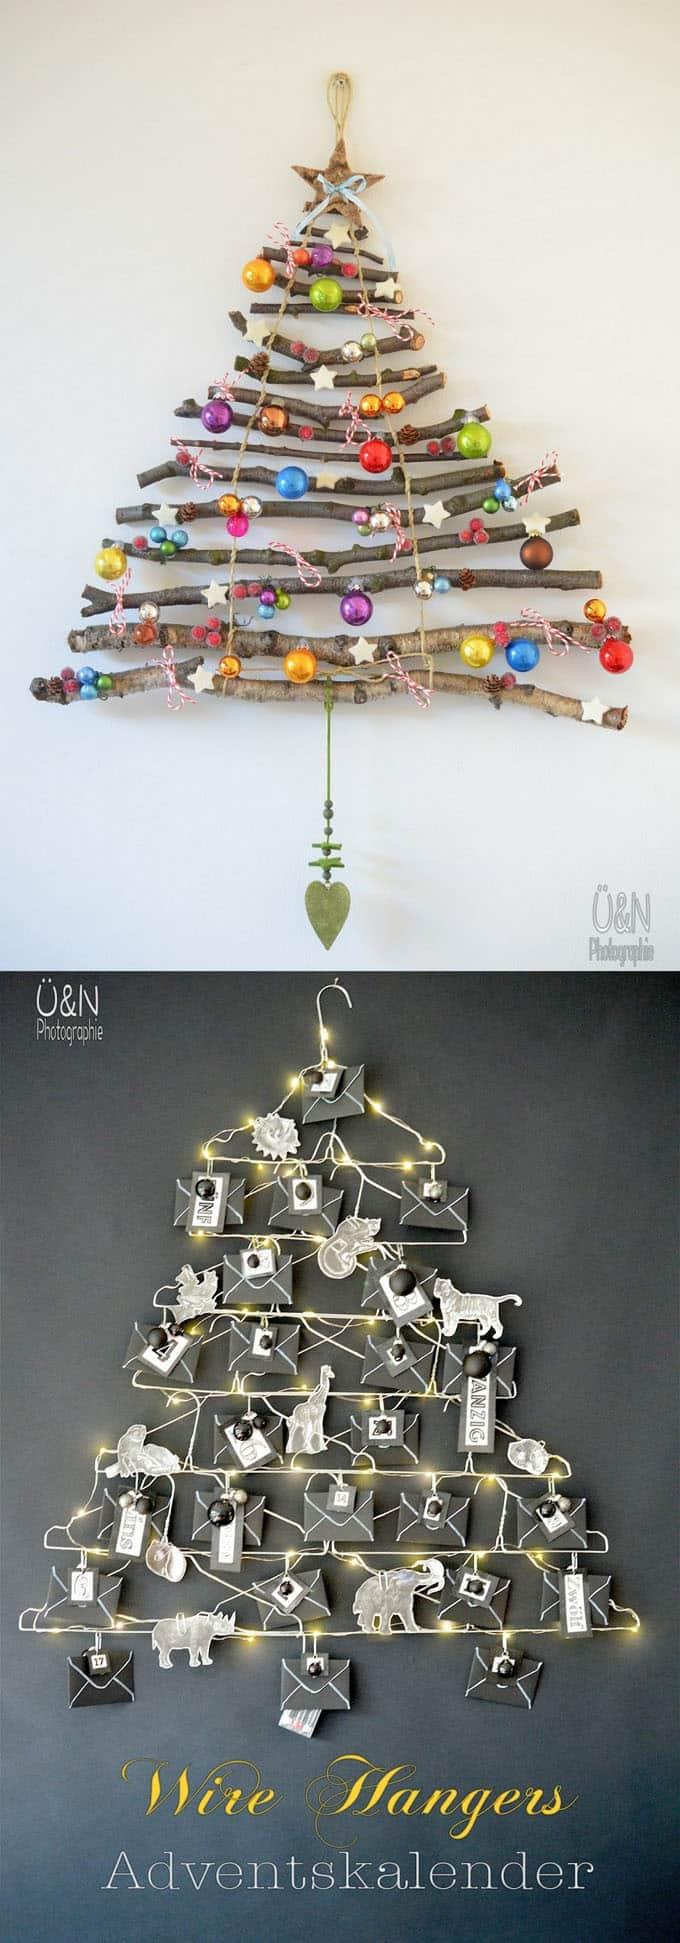 diy christmas tree ideas apieceofrainbow 9 - 48 Amazing Alternative Christmas Tree Ideas